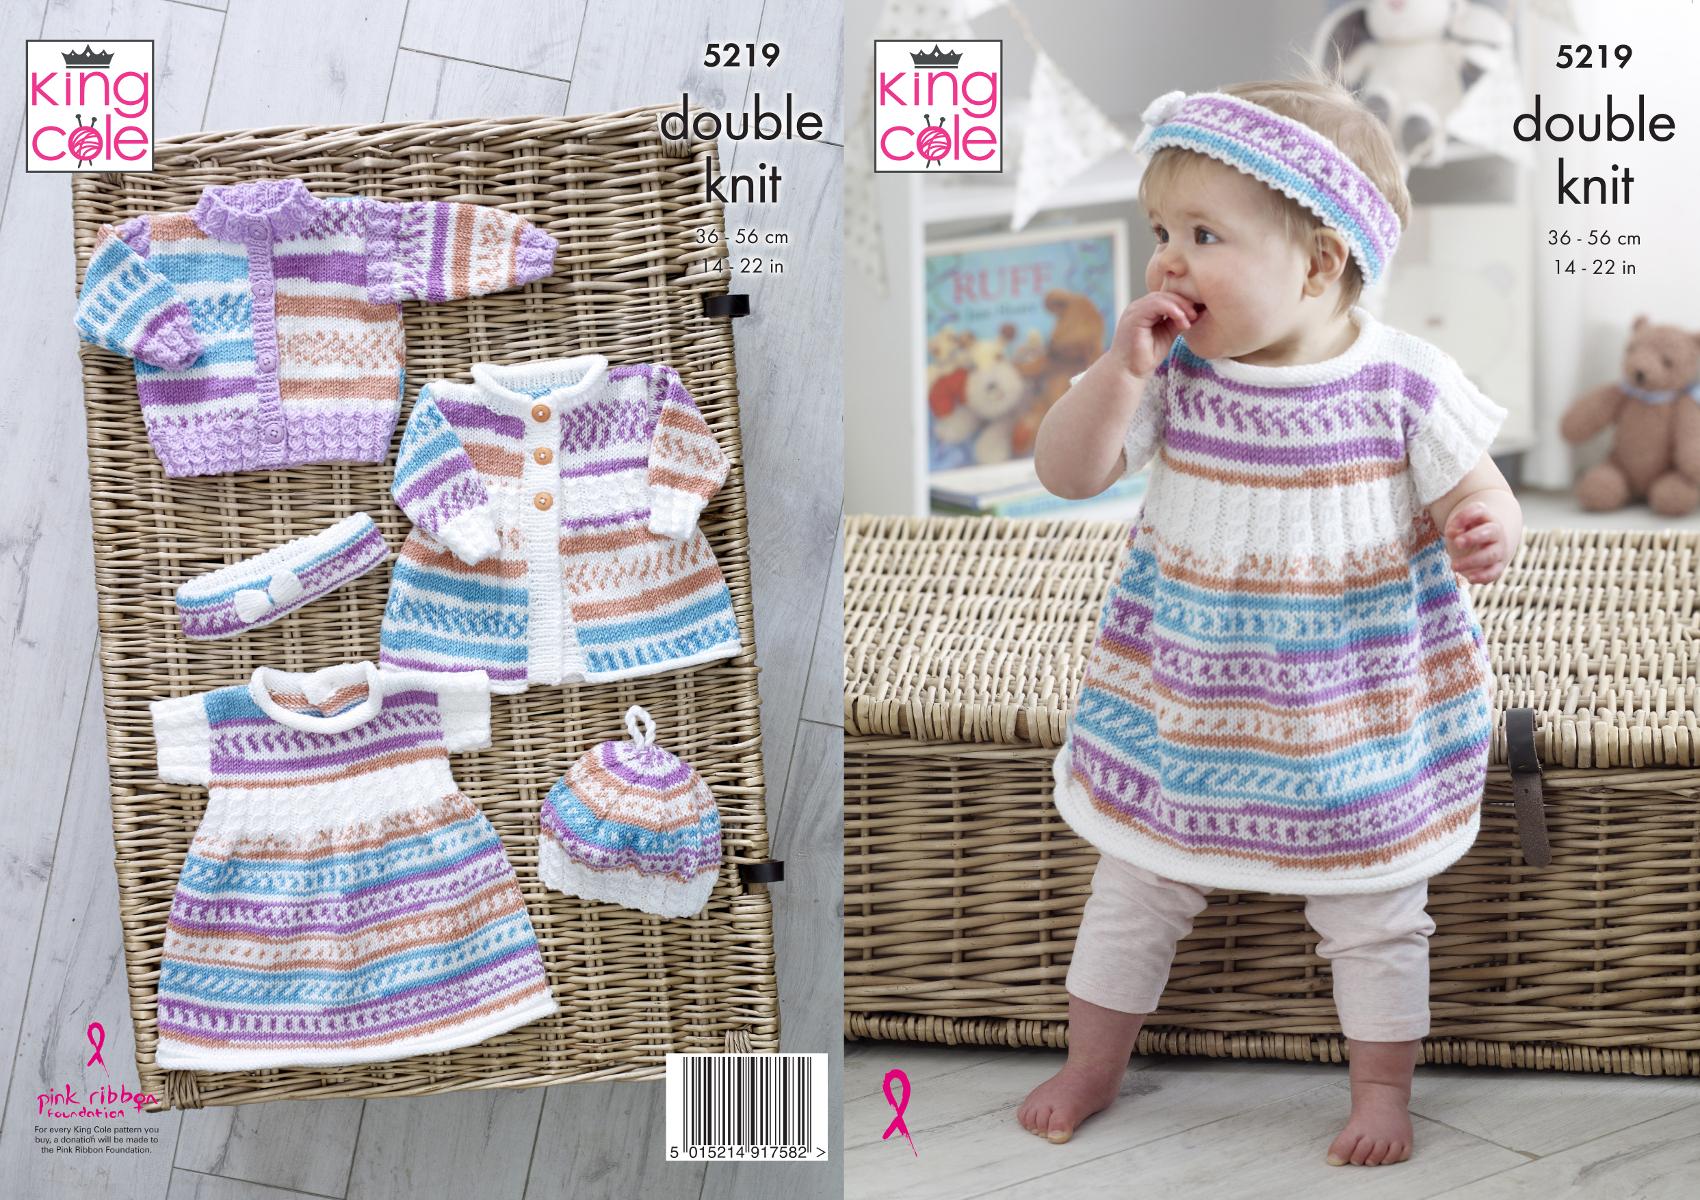 c9f7ce0b4cb37 King Cole Baby Double Knitting Pattern Cardigan Dress Coat Beret ...